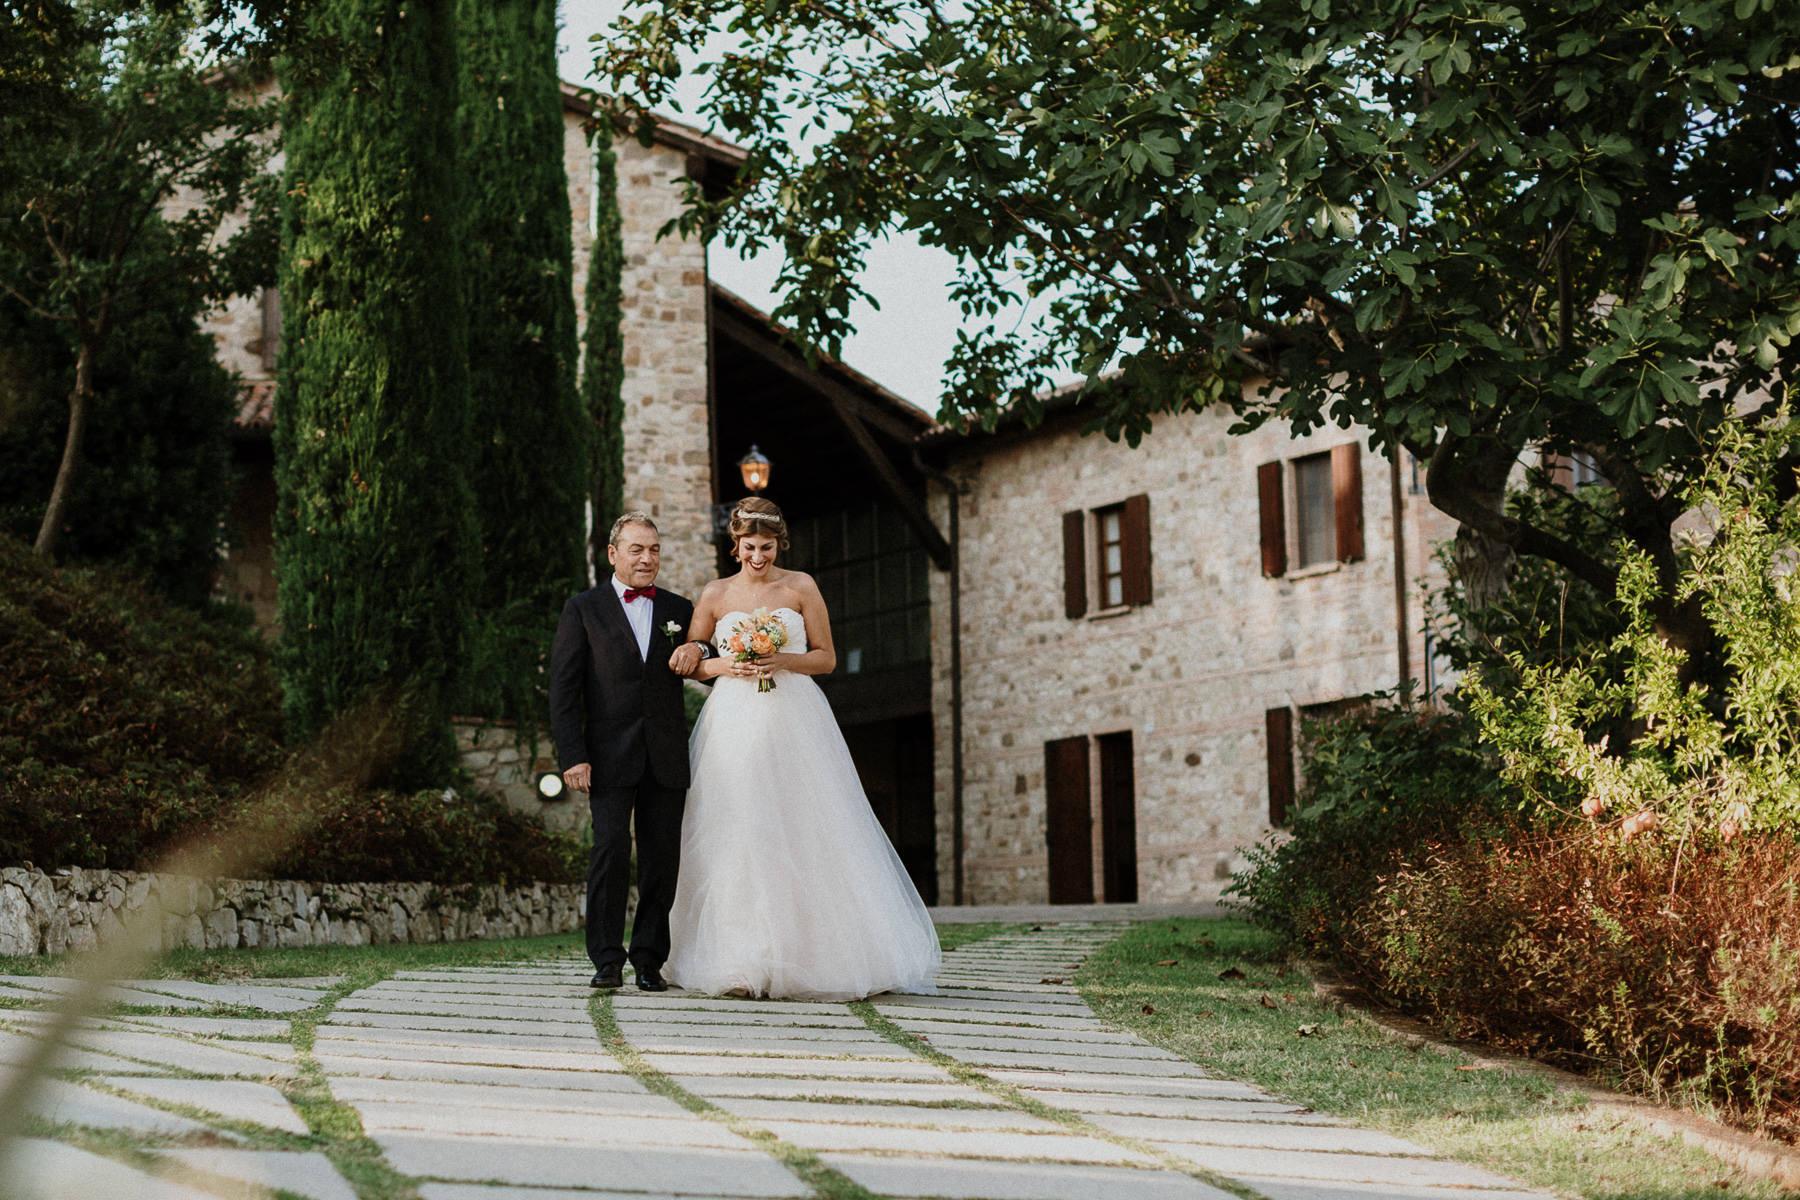 fotografo-matrimonio-monte-gesso-arrivo-cerimonia-civile-sposa-francesco-ferrarini